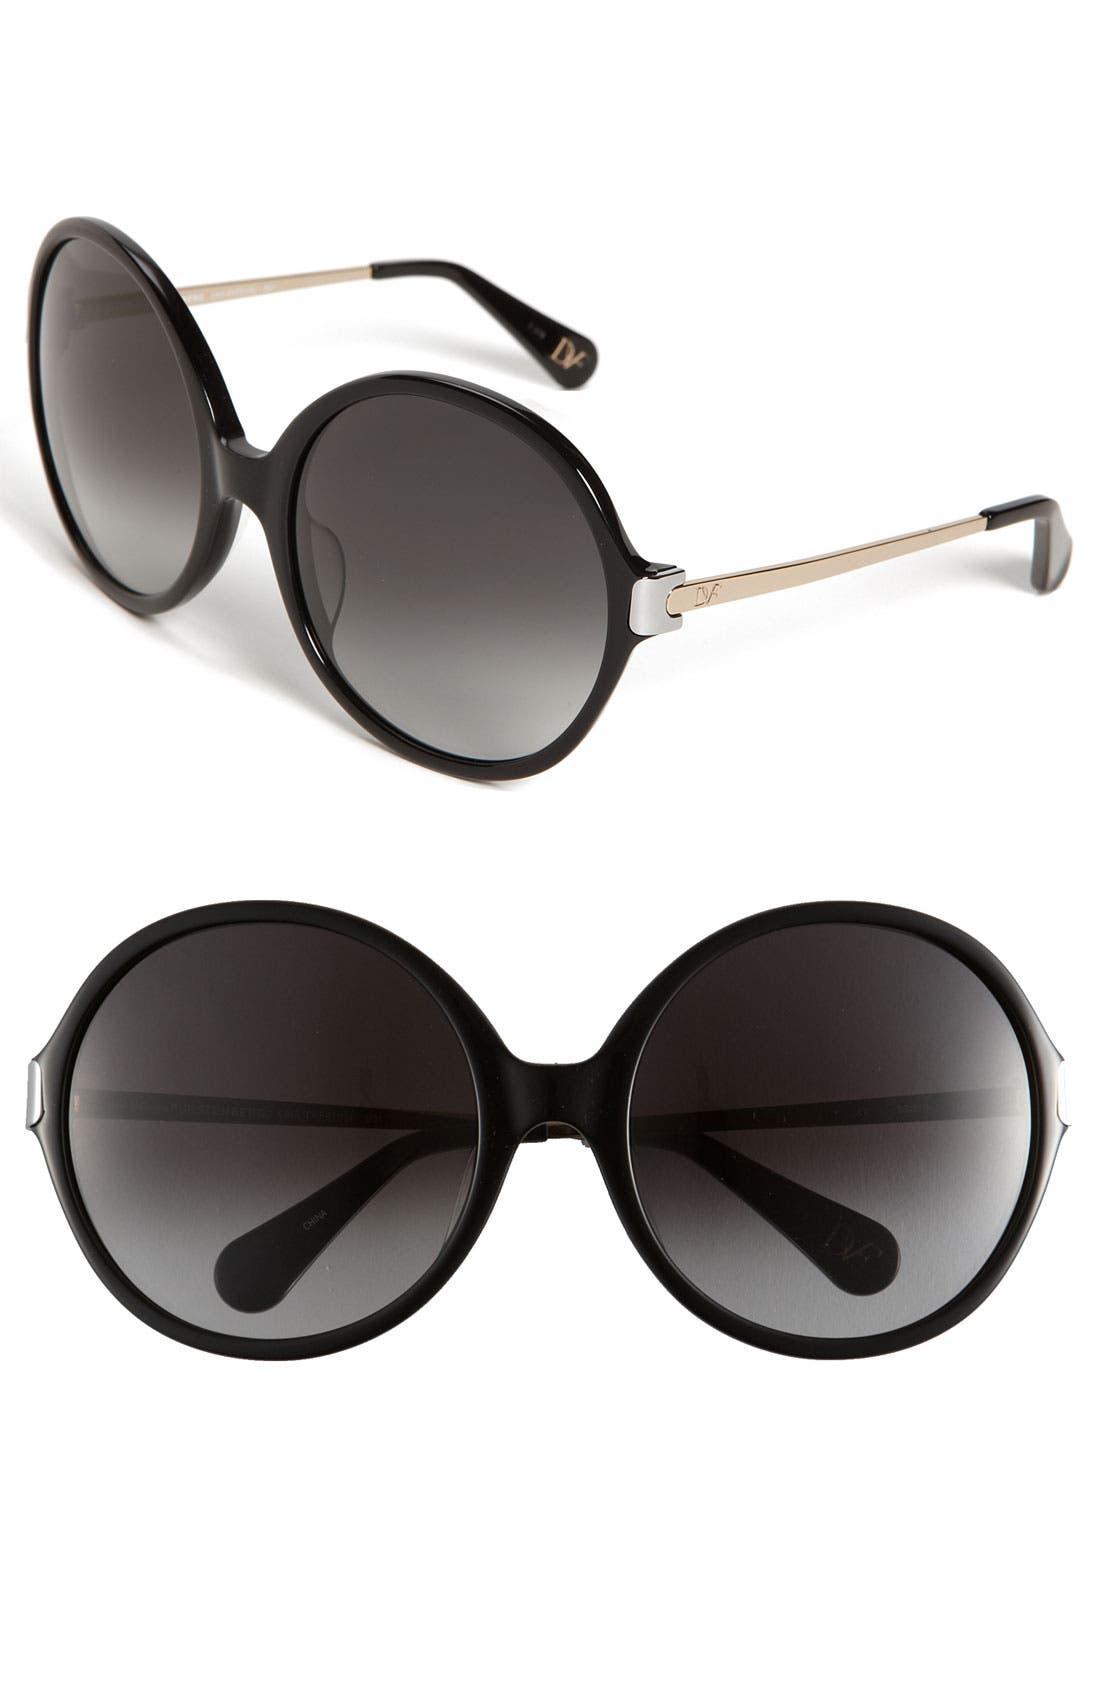 Main Image - Diane von Furstenberg 'Lais' Oversized Round Sunglasses